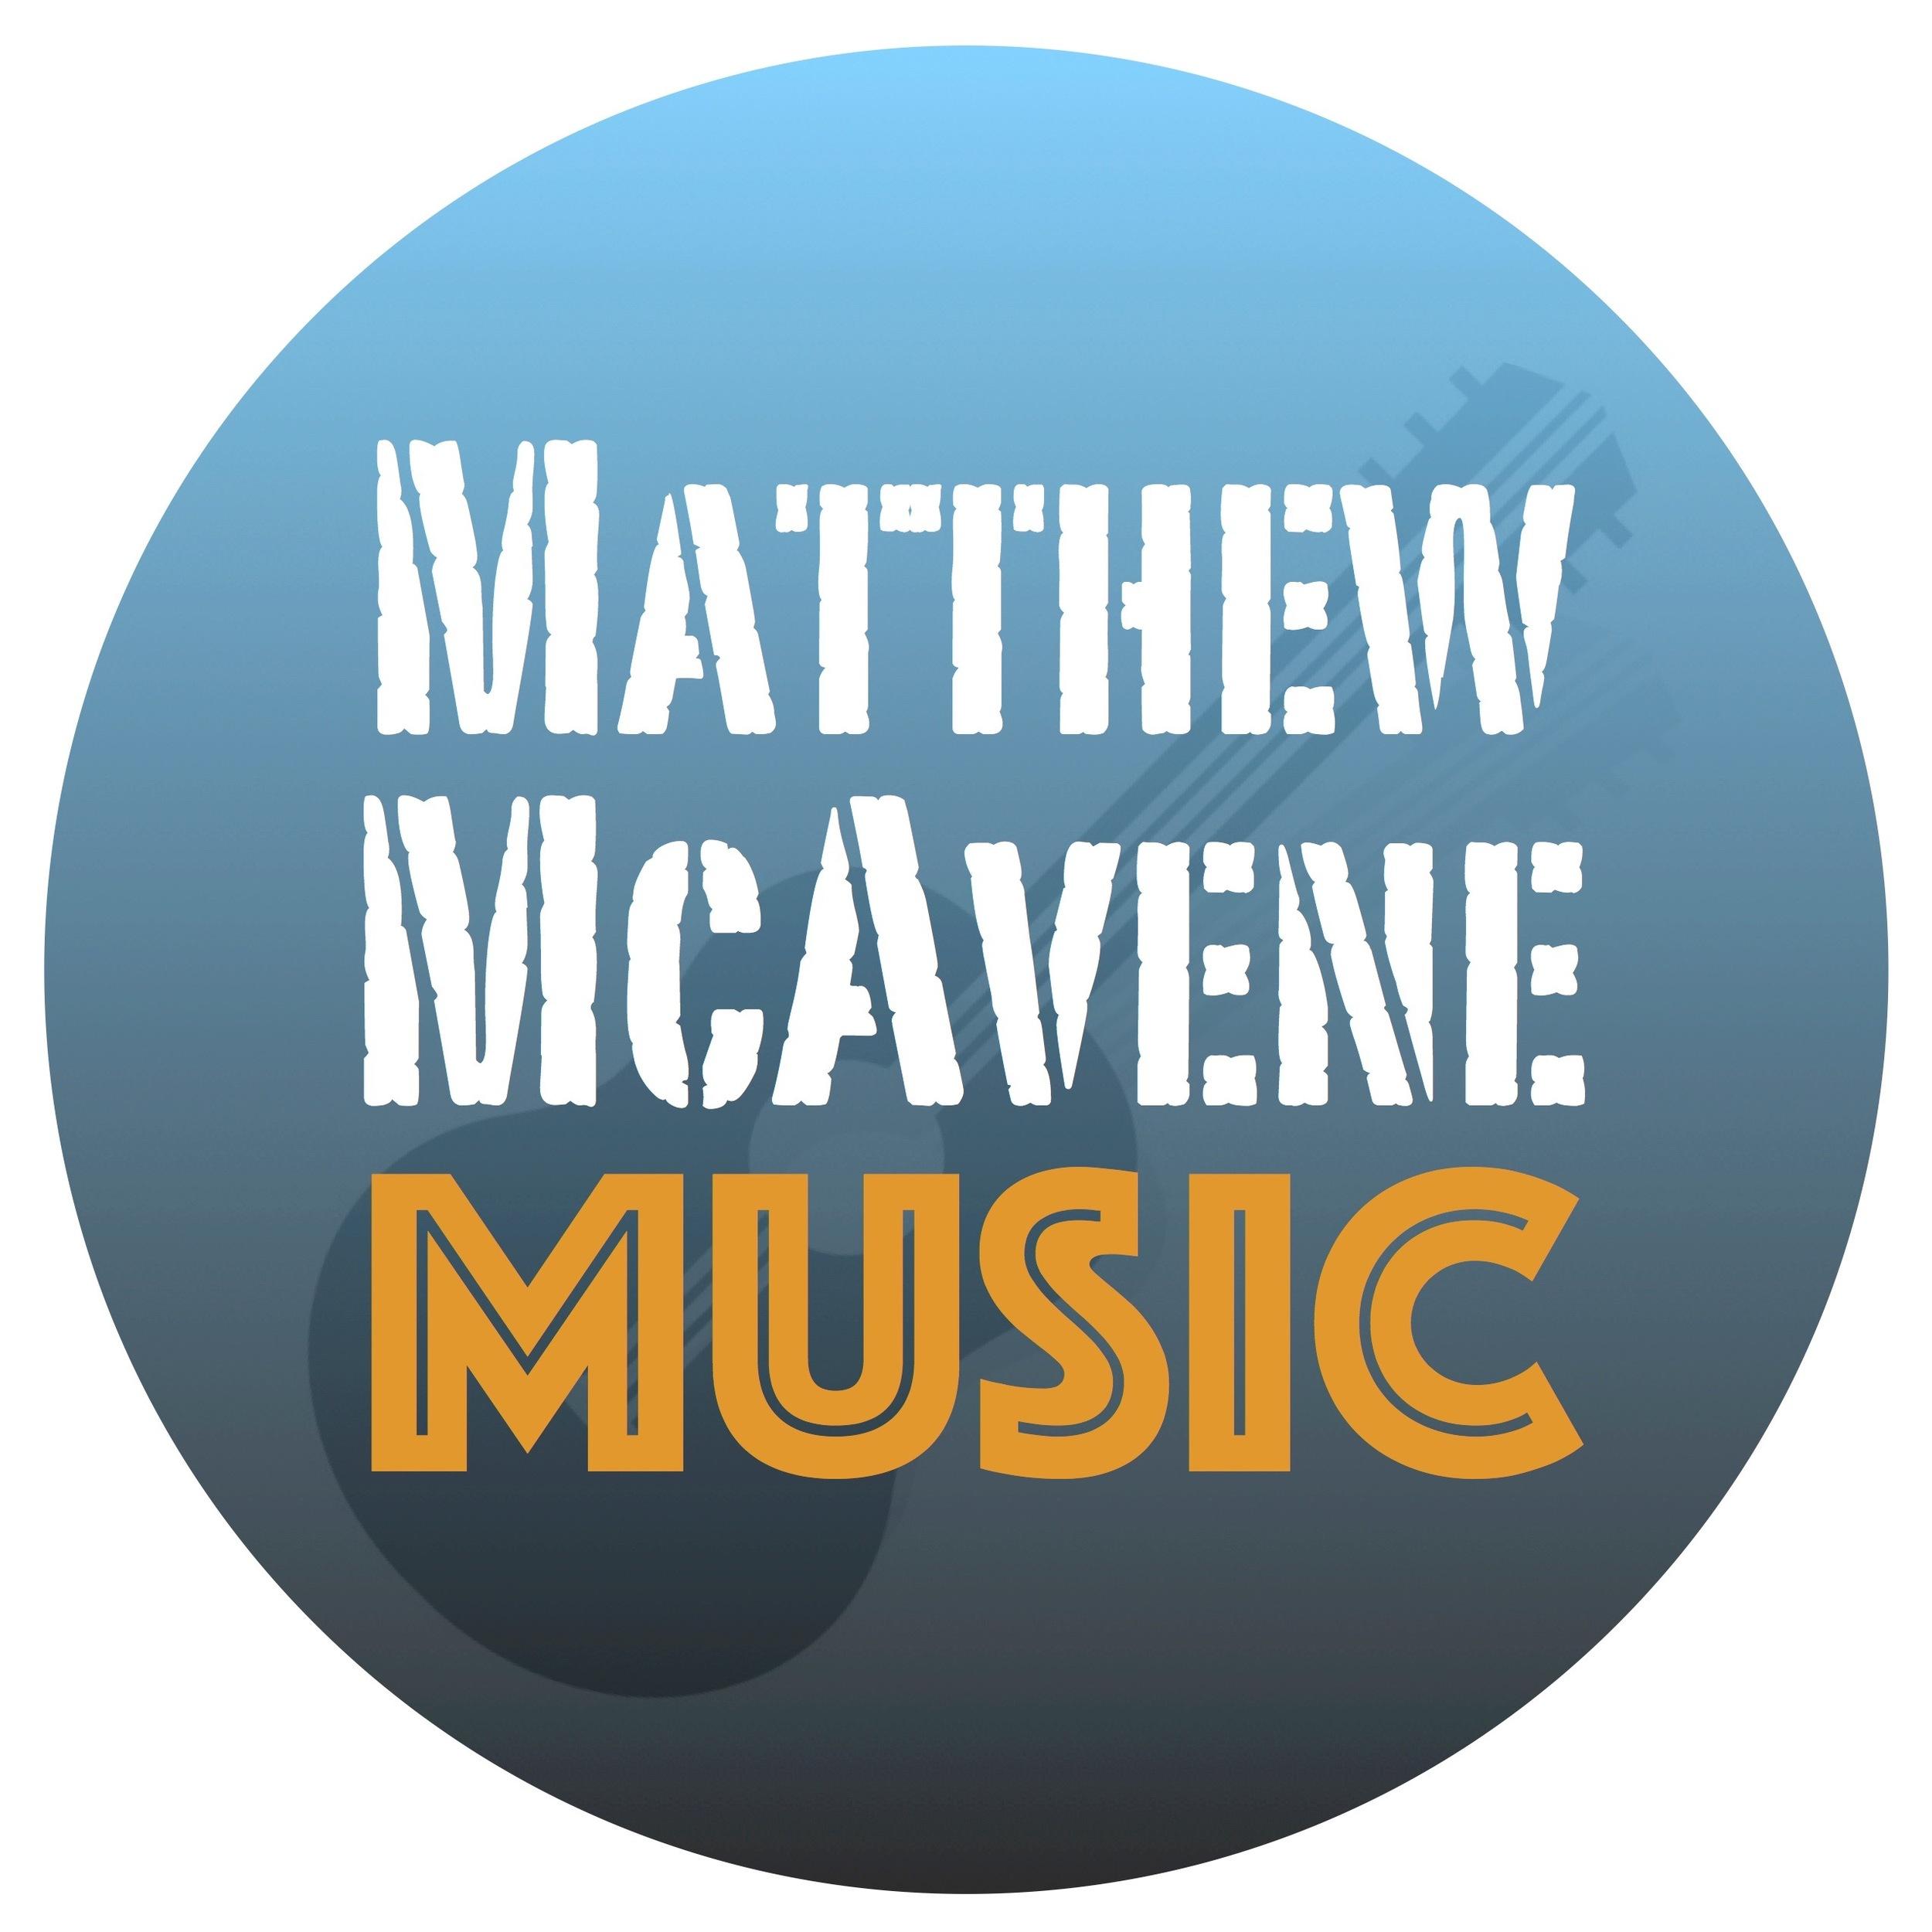 Matthew McAvene Music Logo